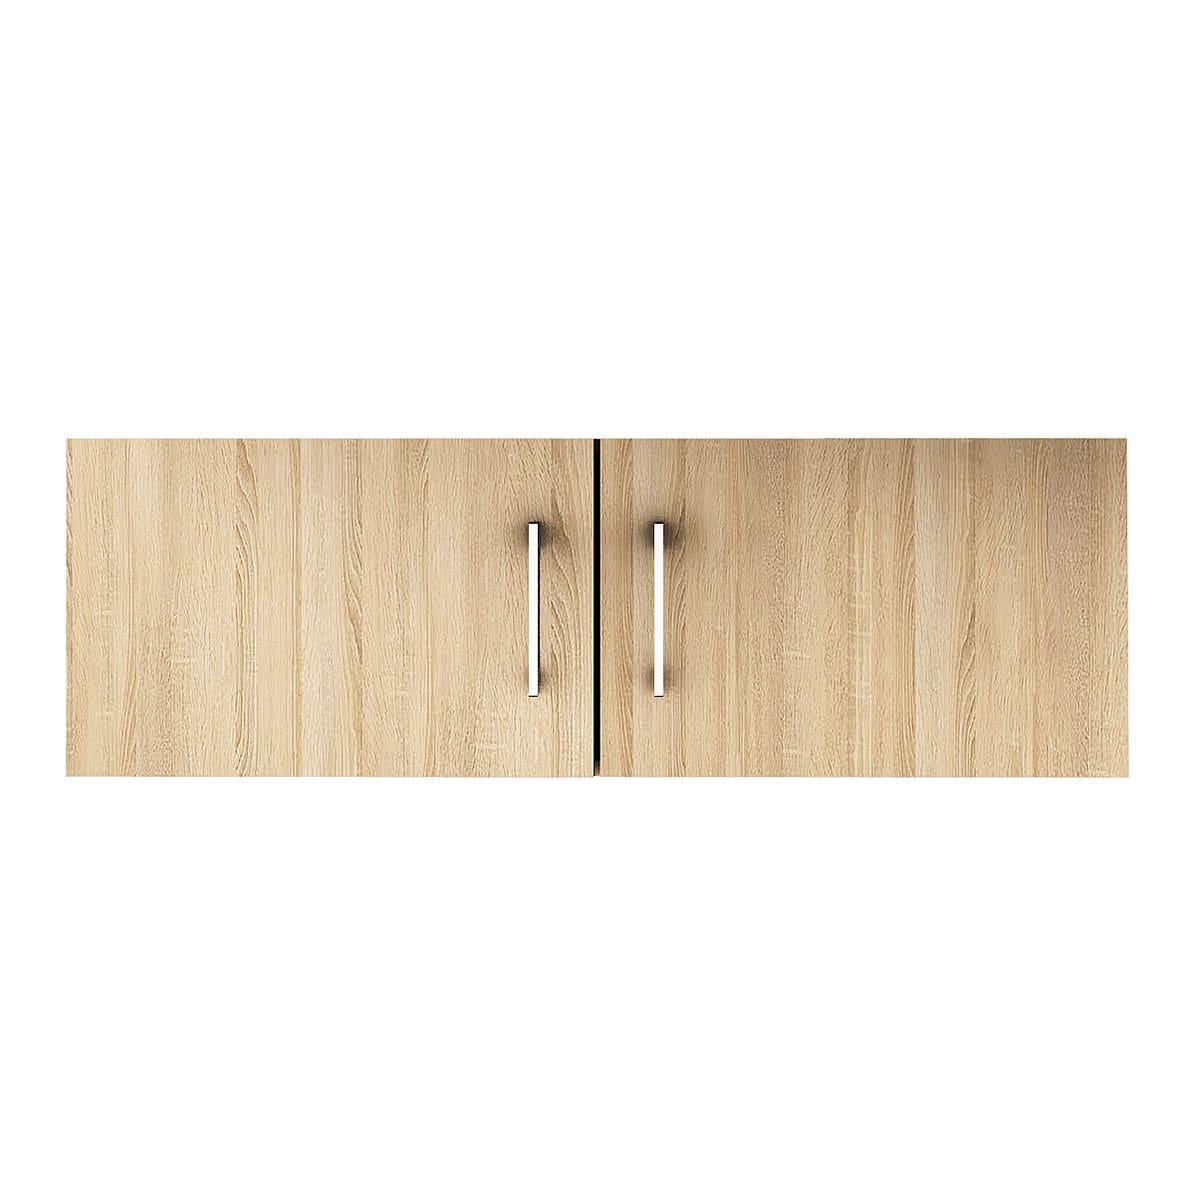 wellem bel aufsatzschrank kleiderschrankwunder front. Black Bedroom Furniture Sets. Home Design Ideas